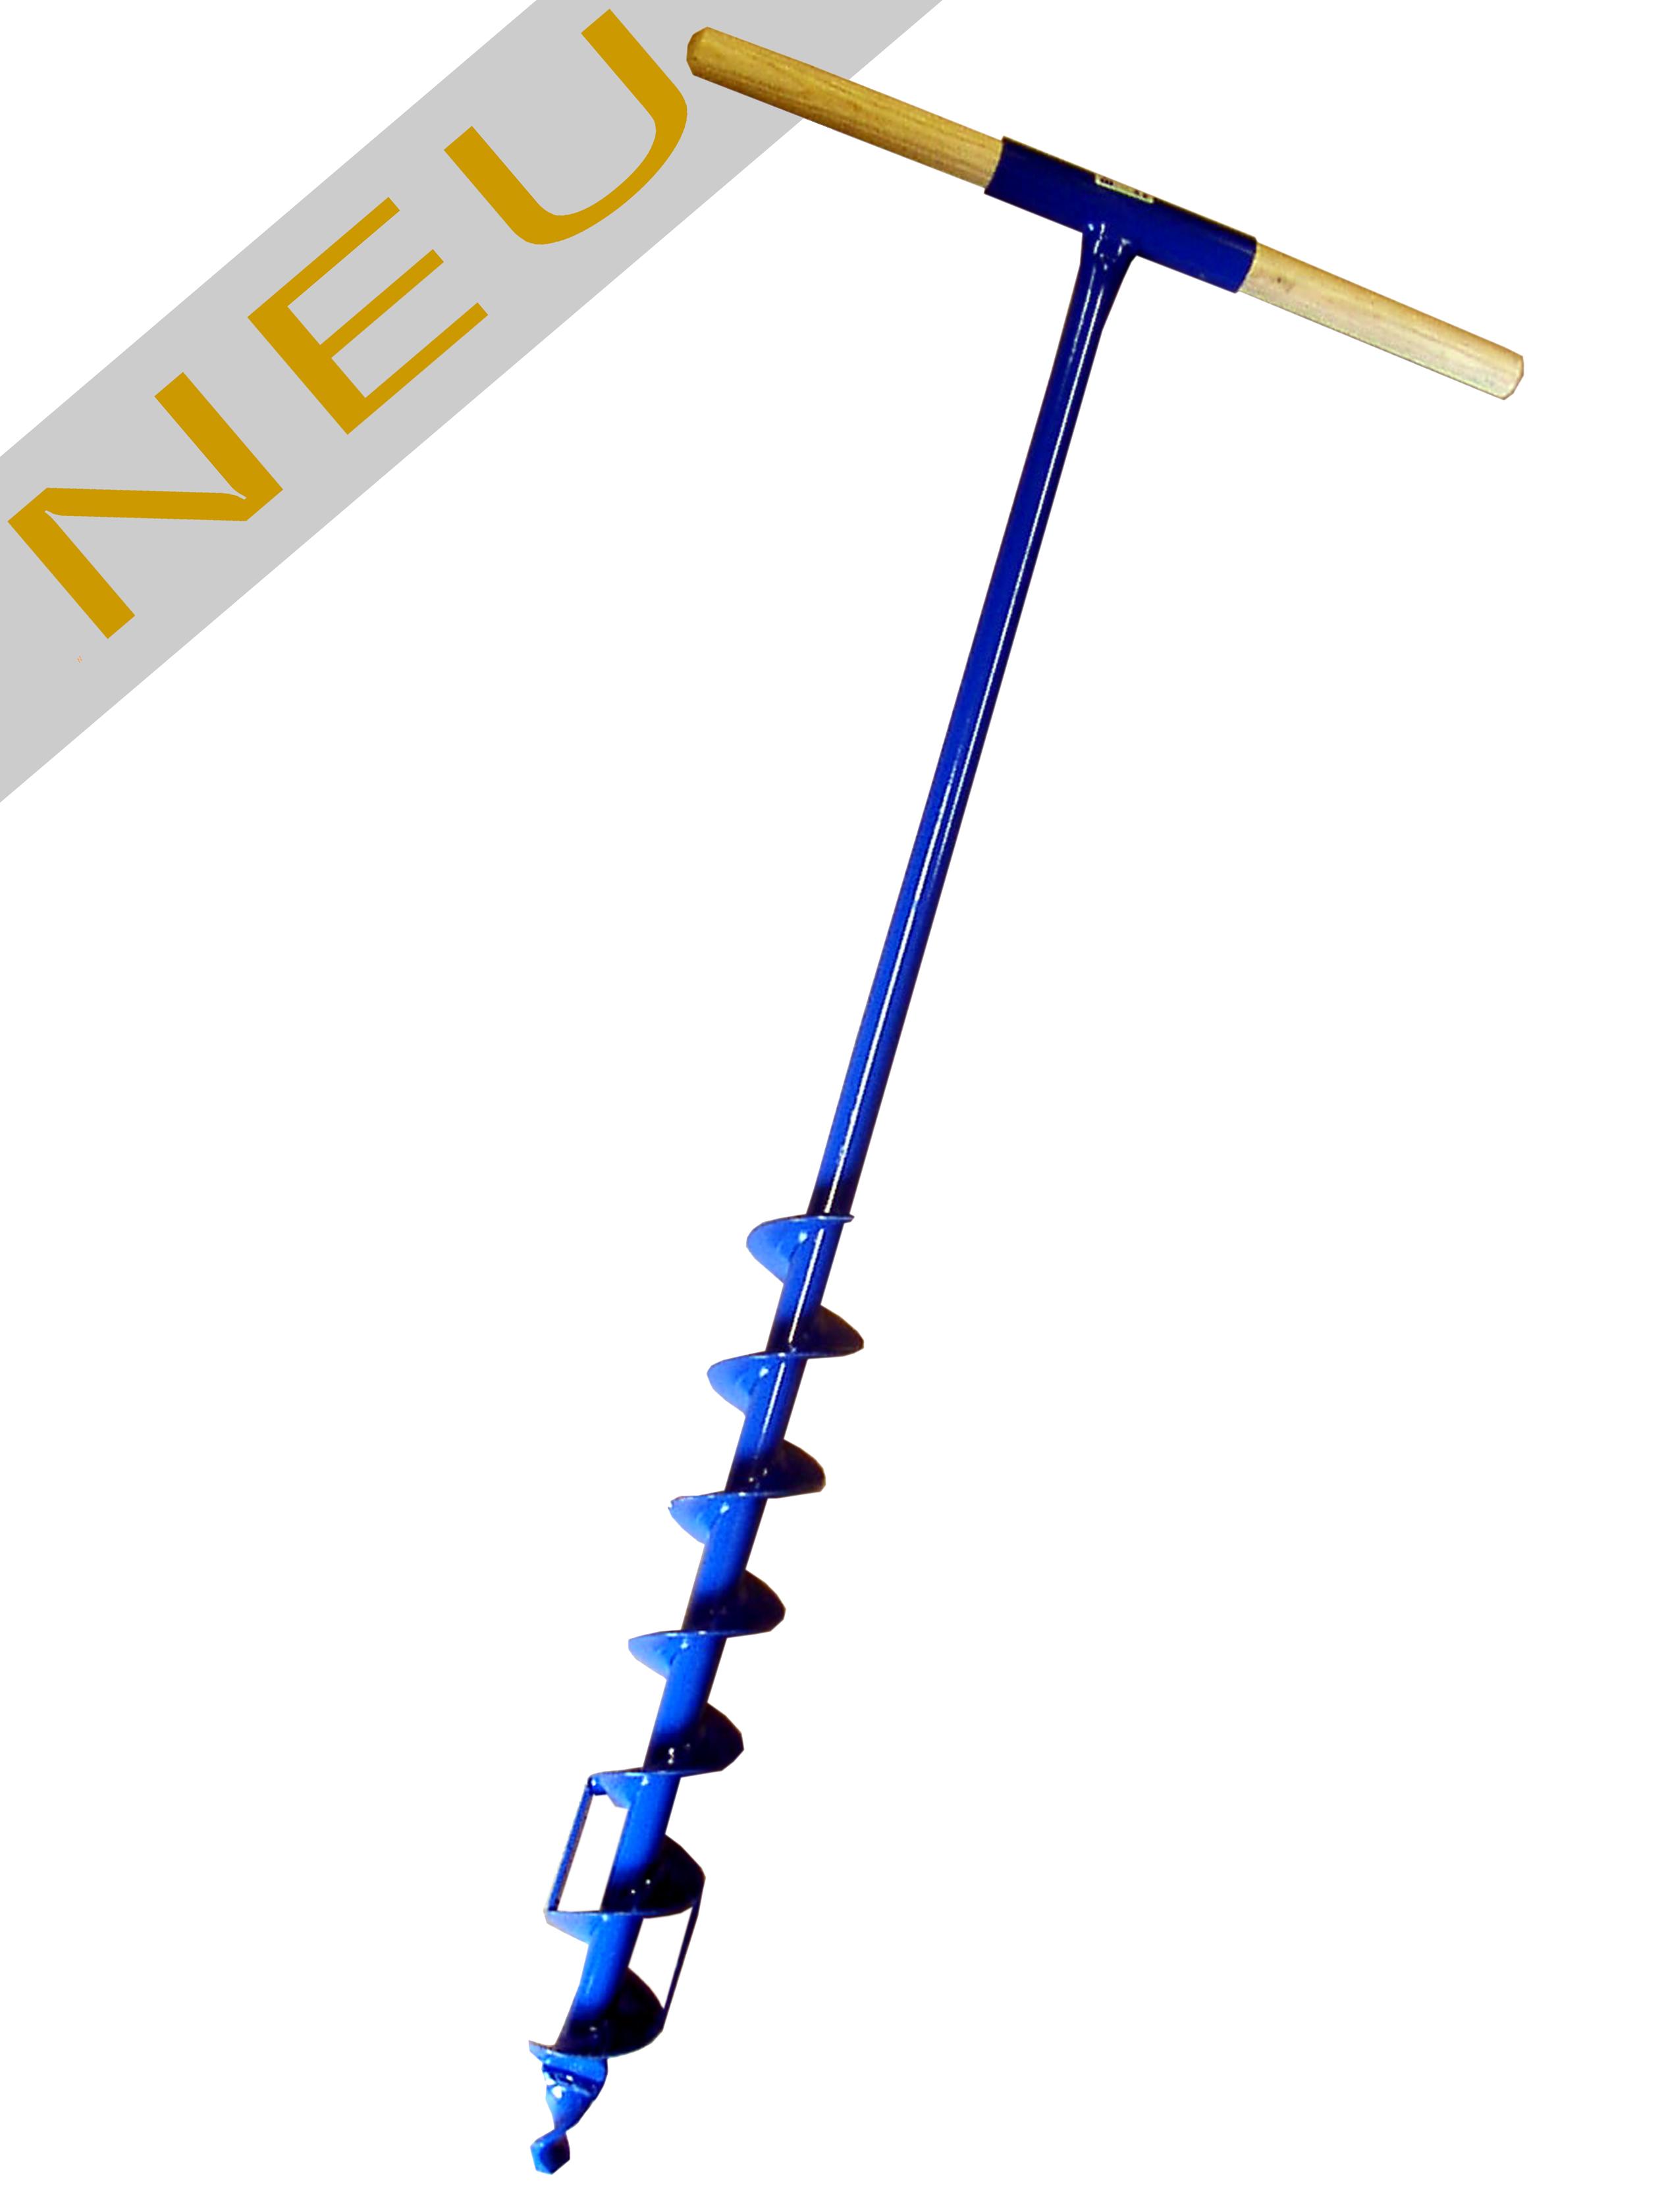 Erdbohrer 130 mm 13cm - 1m lang blau pulverbeschichtung